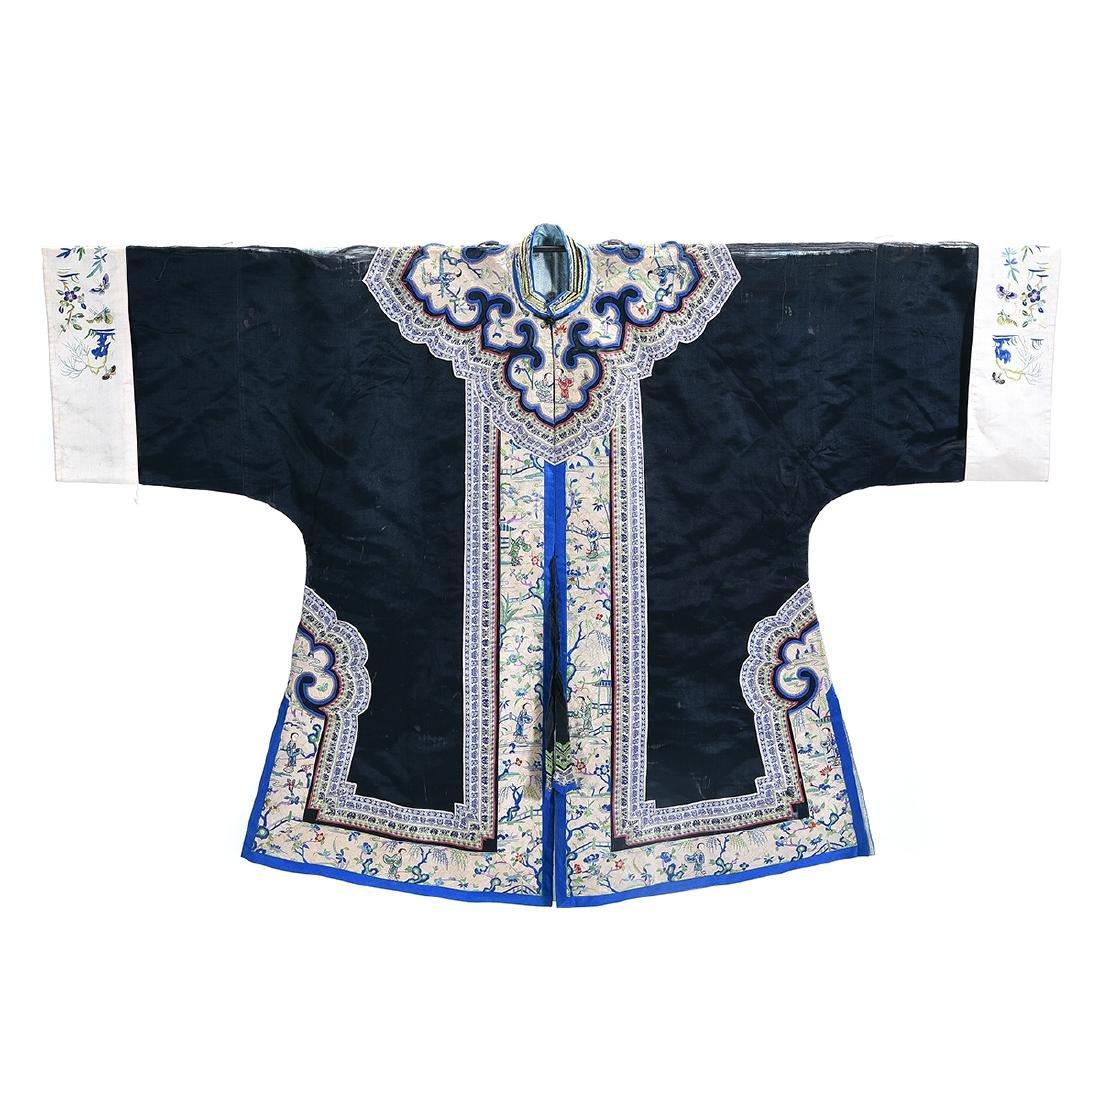 Embroidered Silk Black Ground Lady's Robe